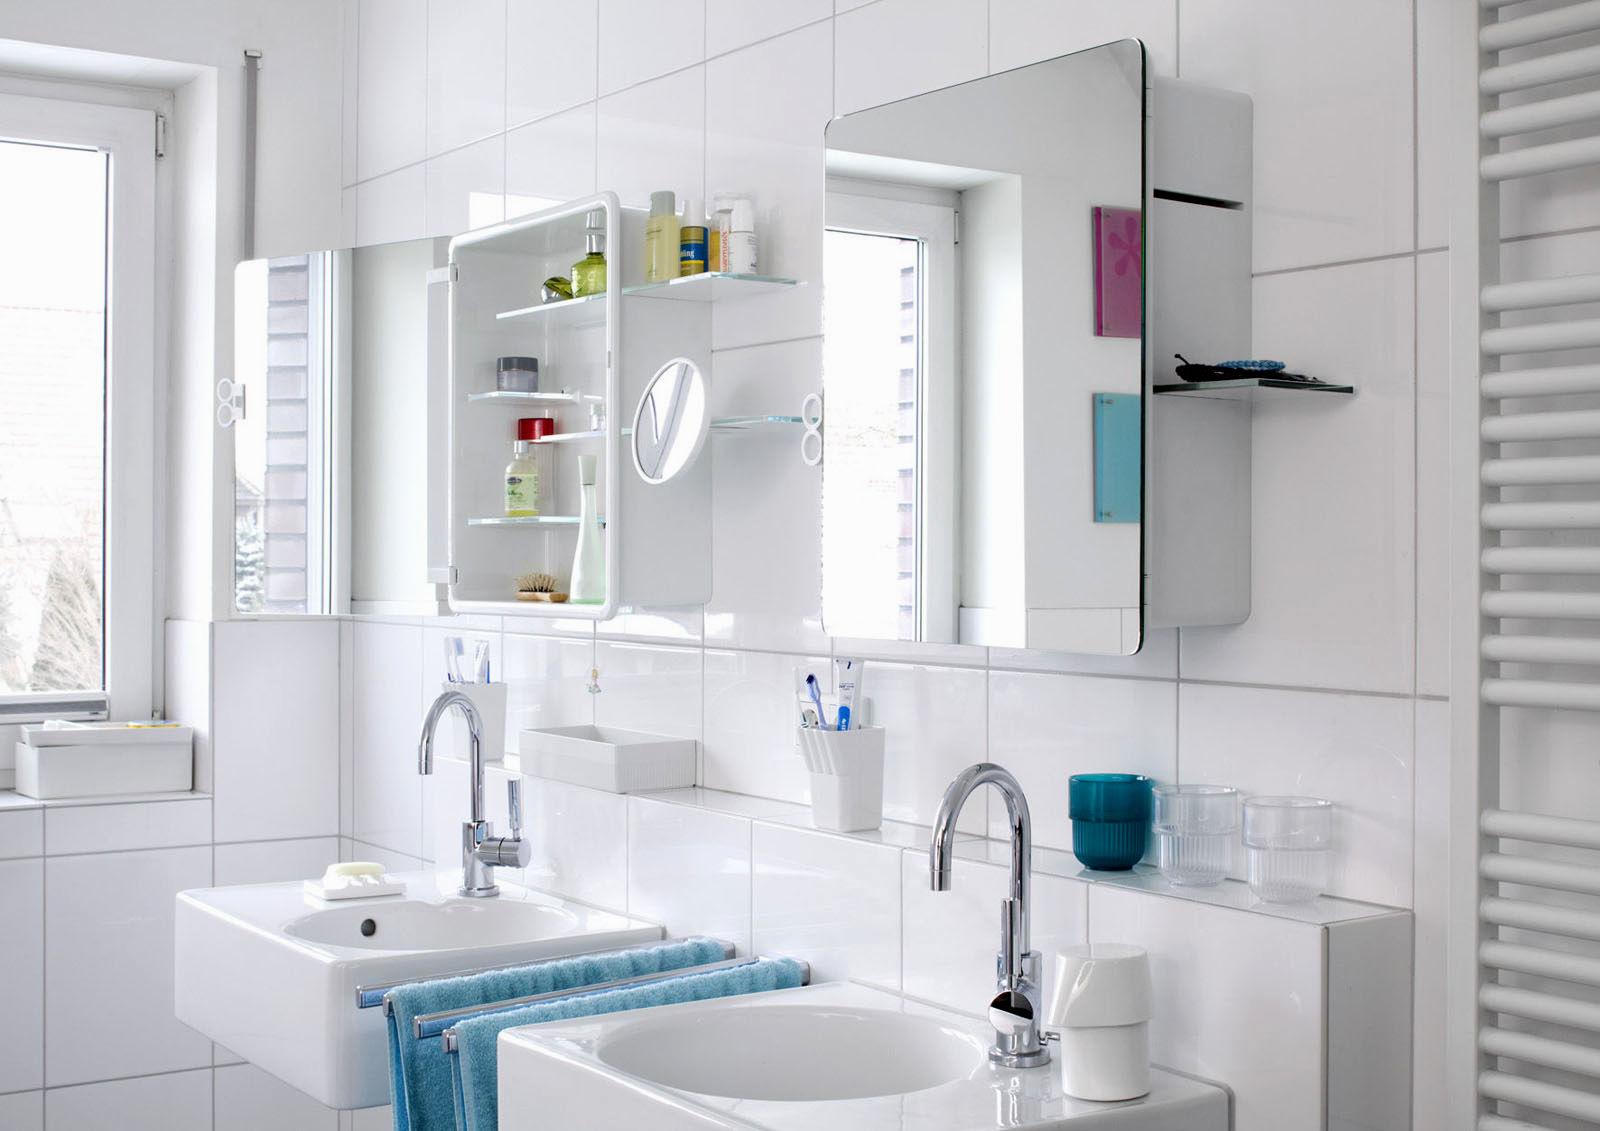 luxury stainless bathroom sink ideas-Best Stainless Bathroom Sink Inspiration